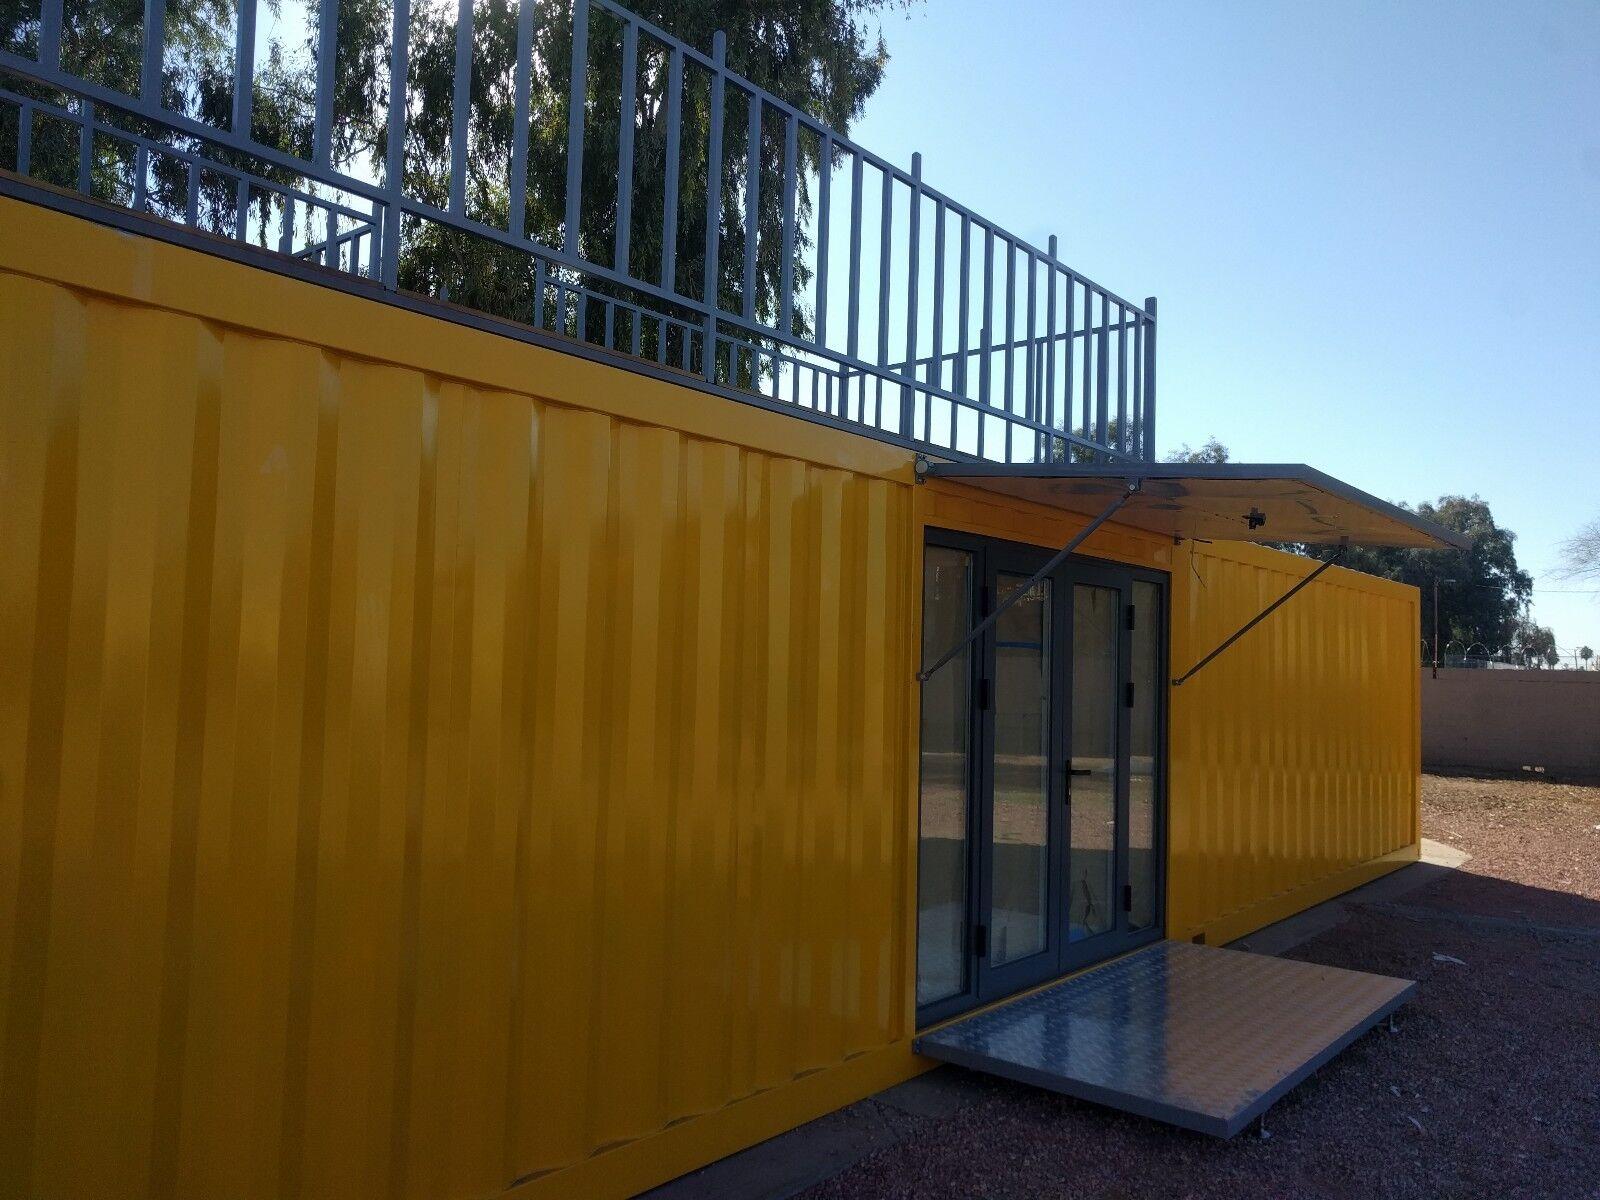 40' Custom Built Shipping Container Home in Phoenix, Arizona. Tiny house!